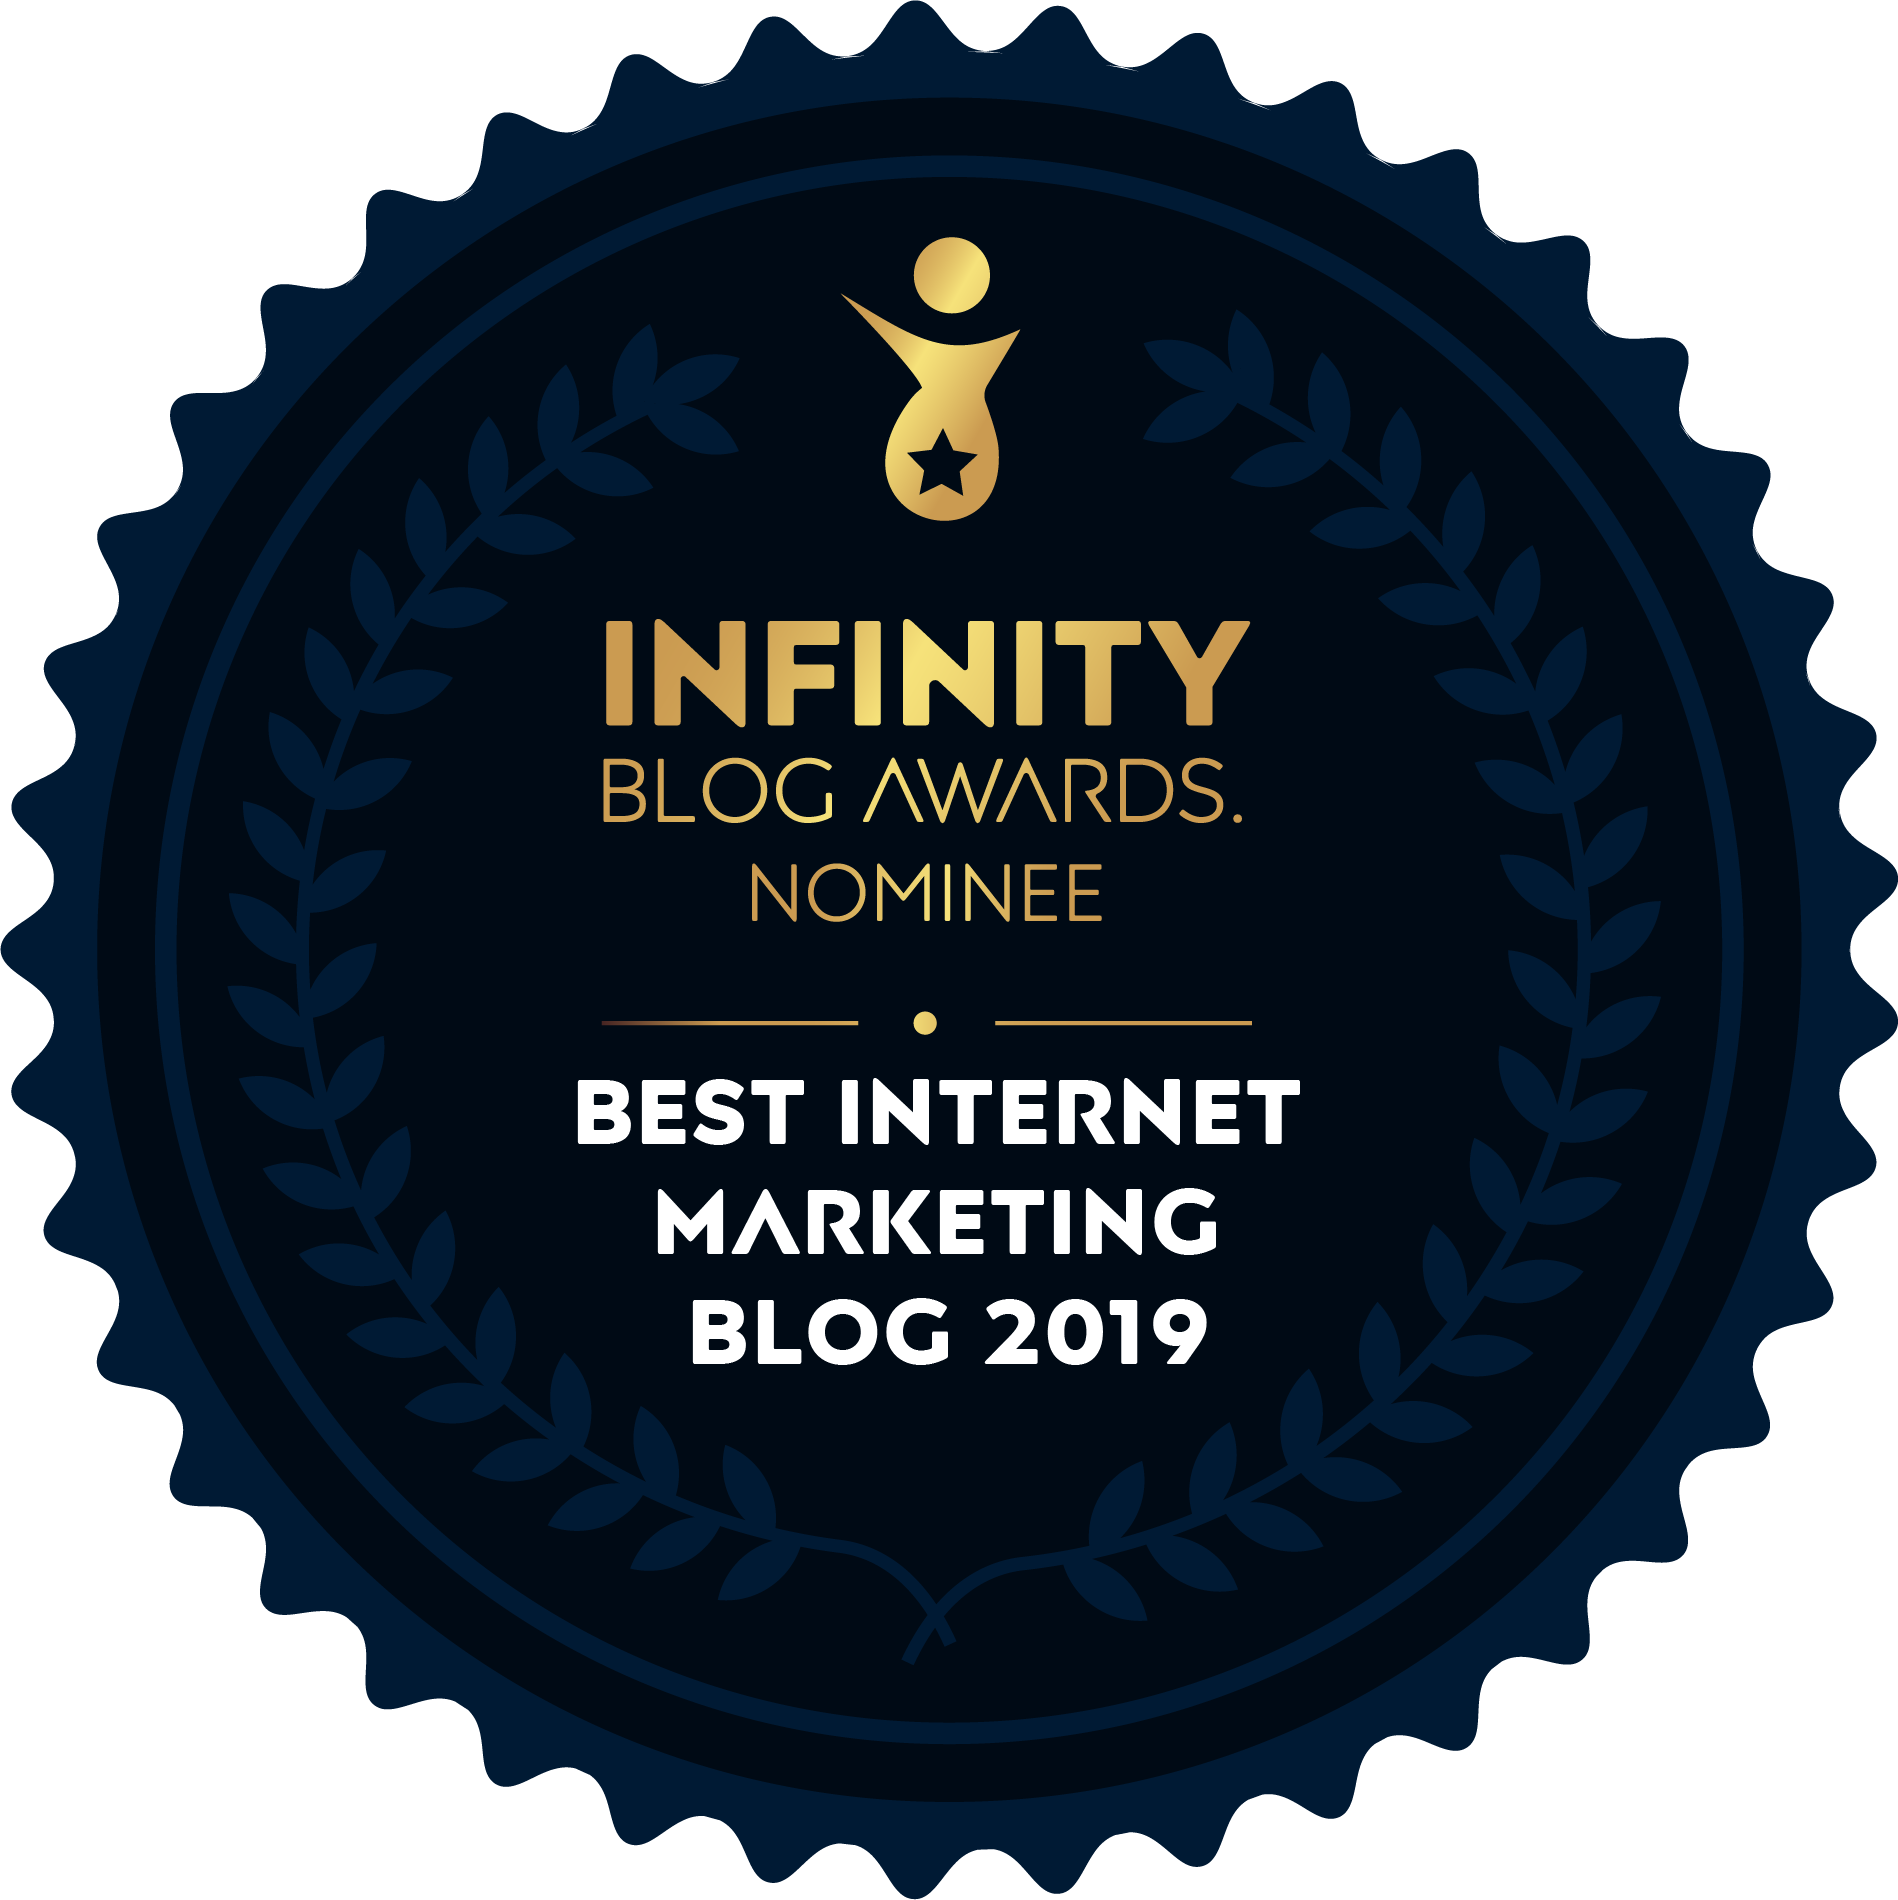 Best Internet Marketing Blog 2019 Nominee badge